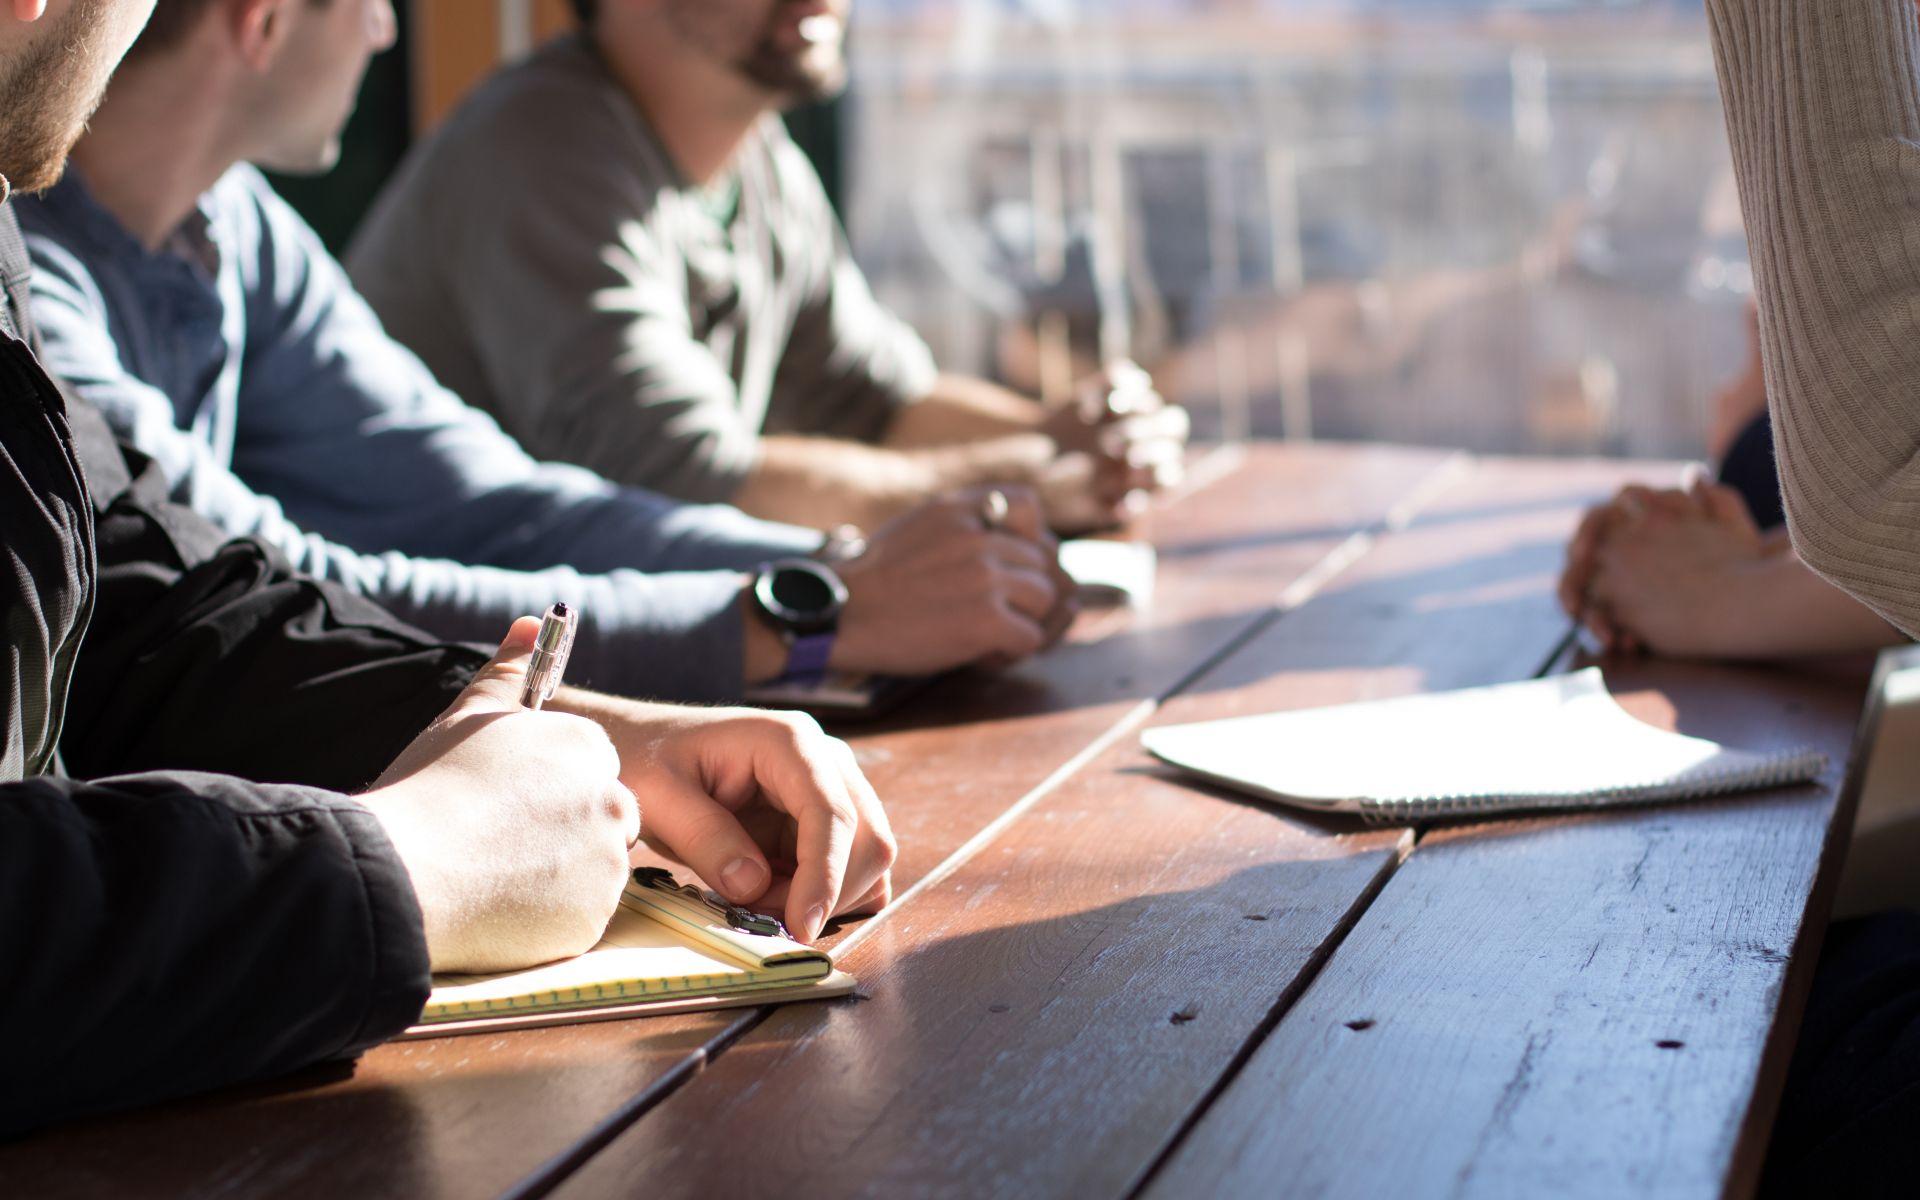 Relais du Saint Bernard secret d'un meeting réussi